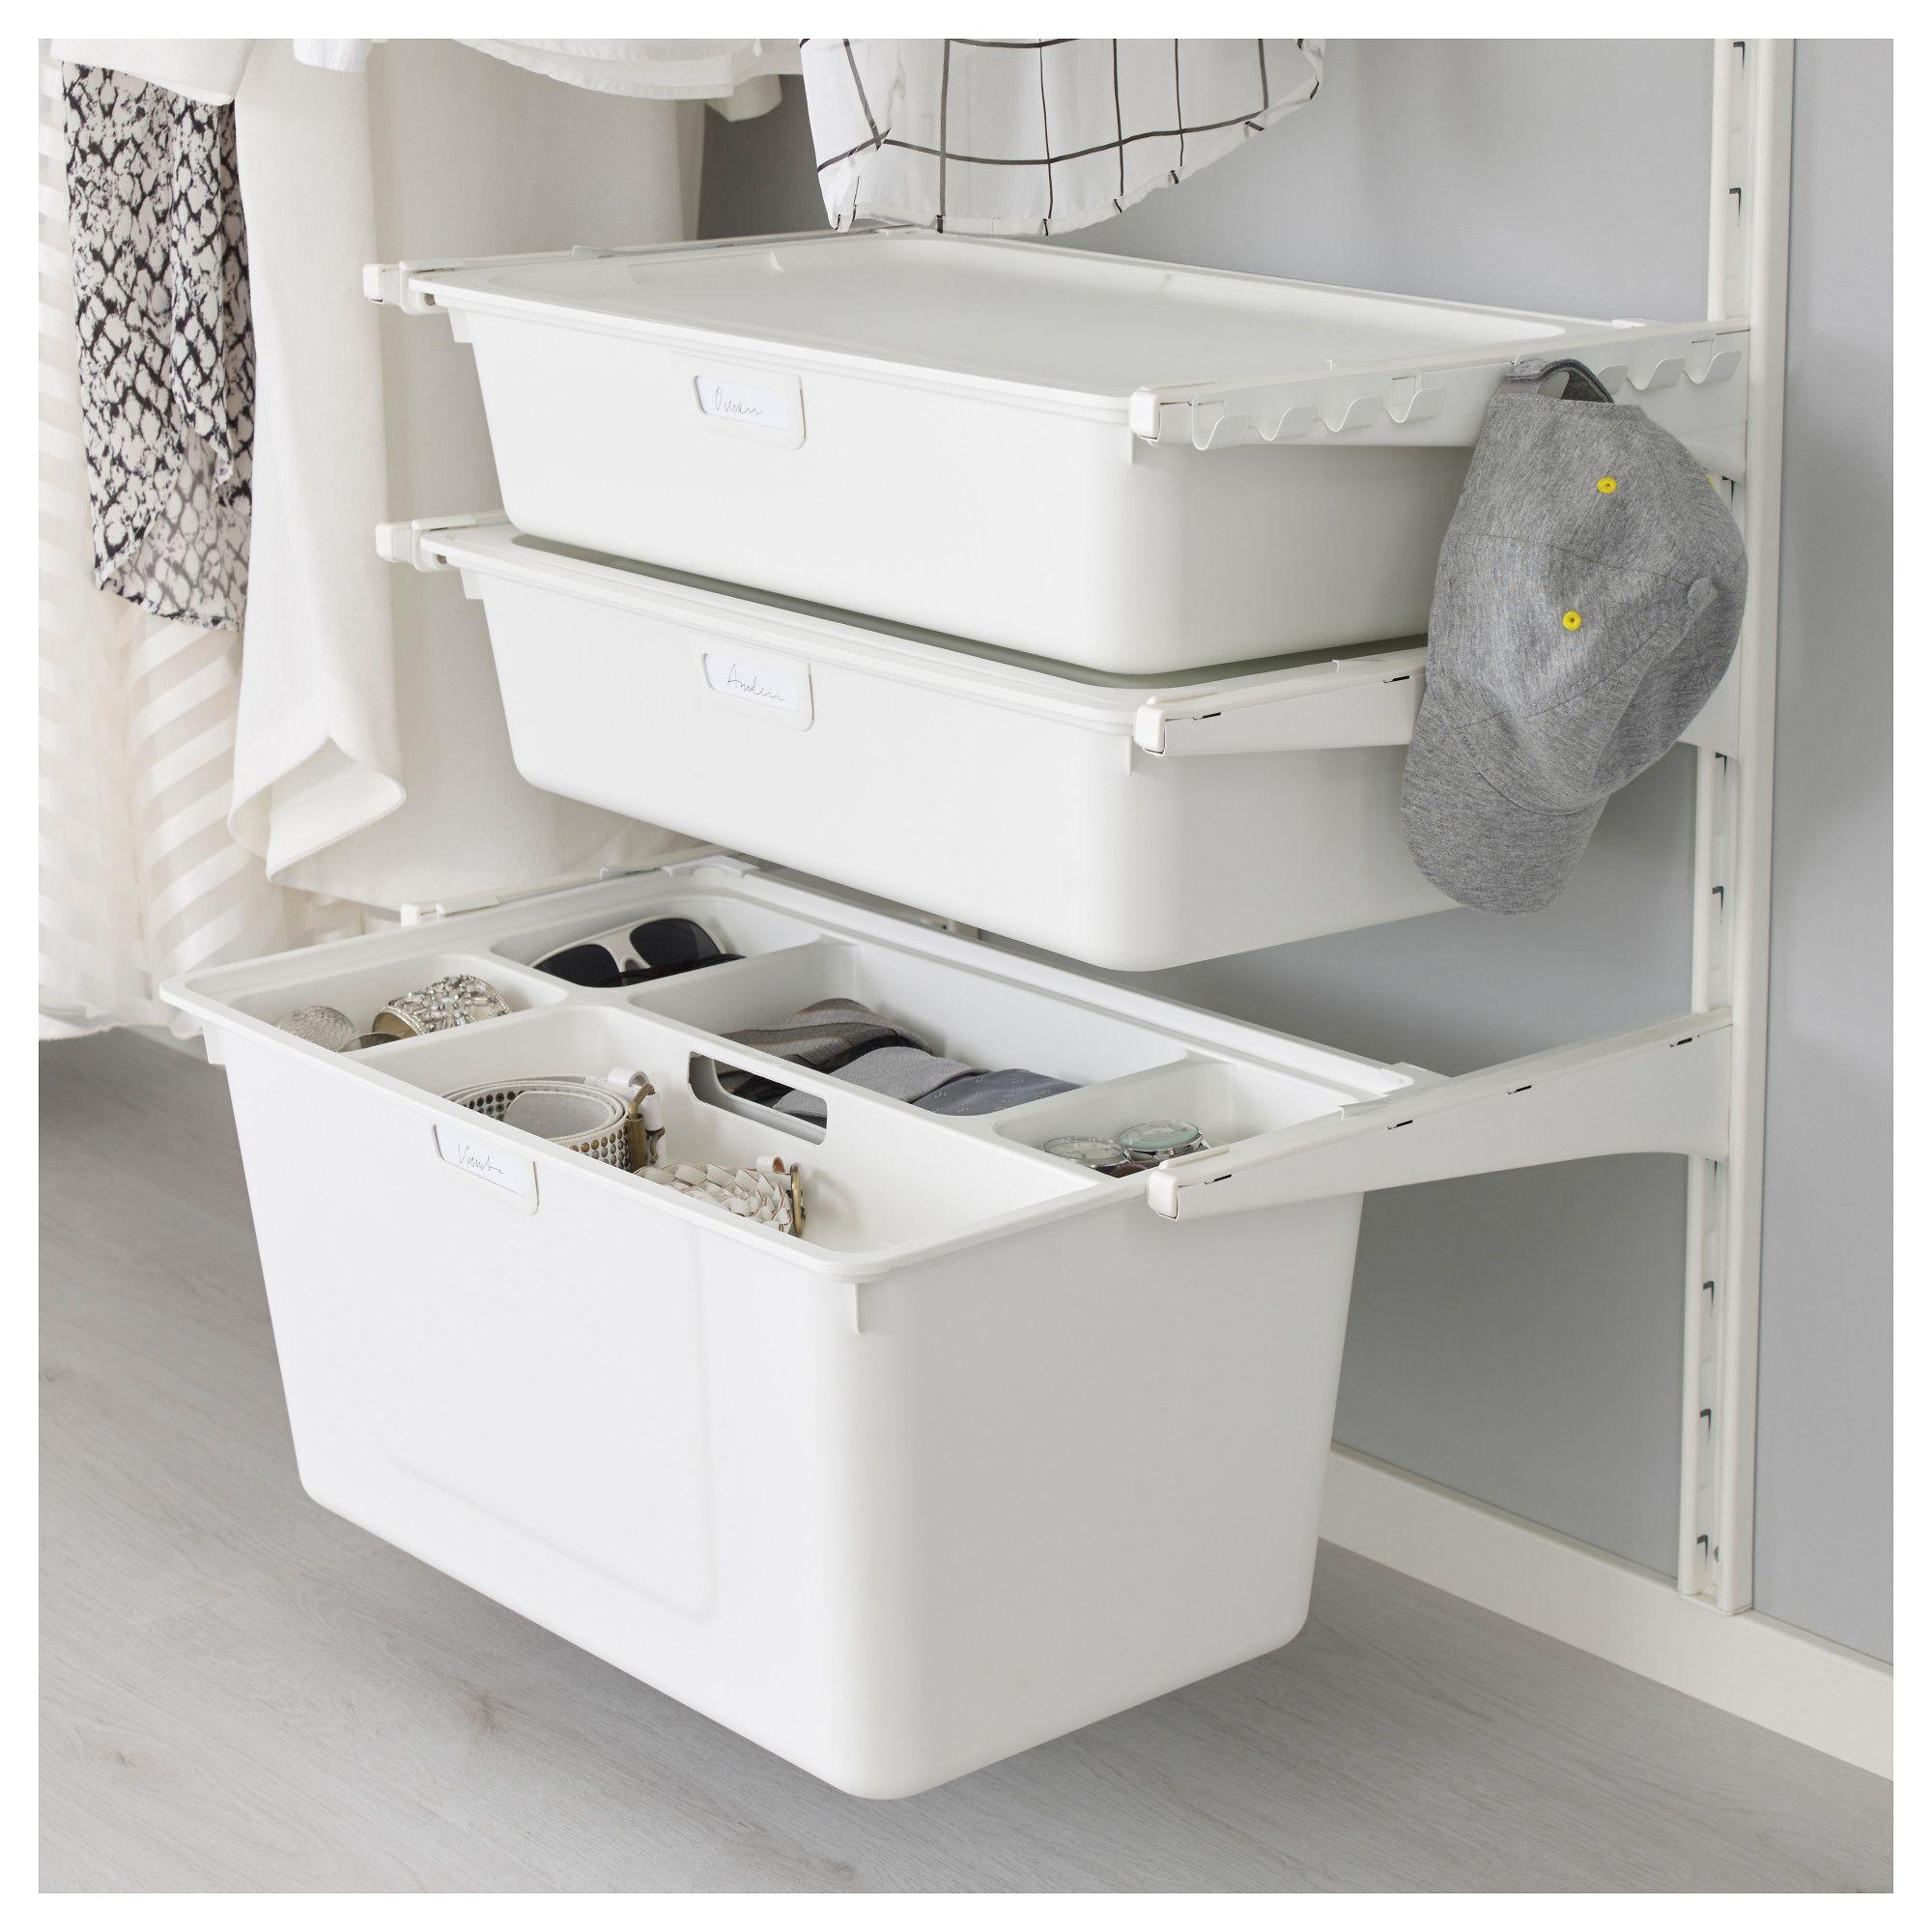 Furniture And Home Furnishings Ikea In 2019 Ikea Algot